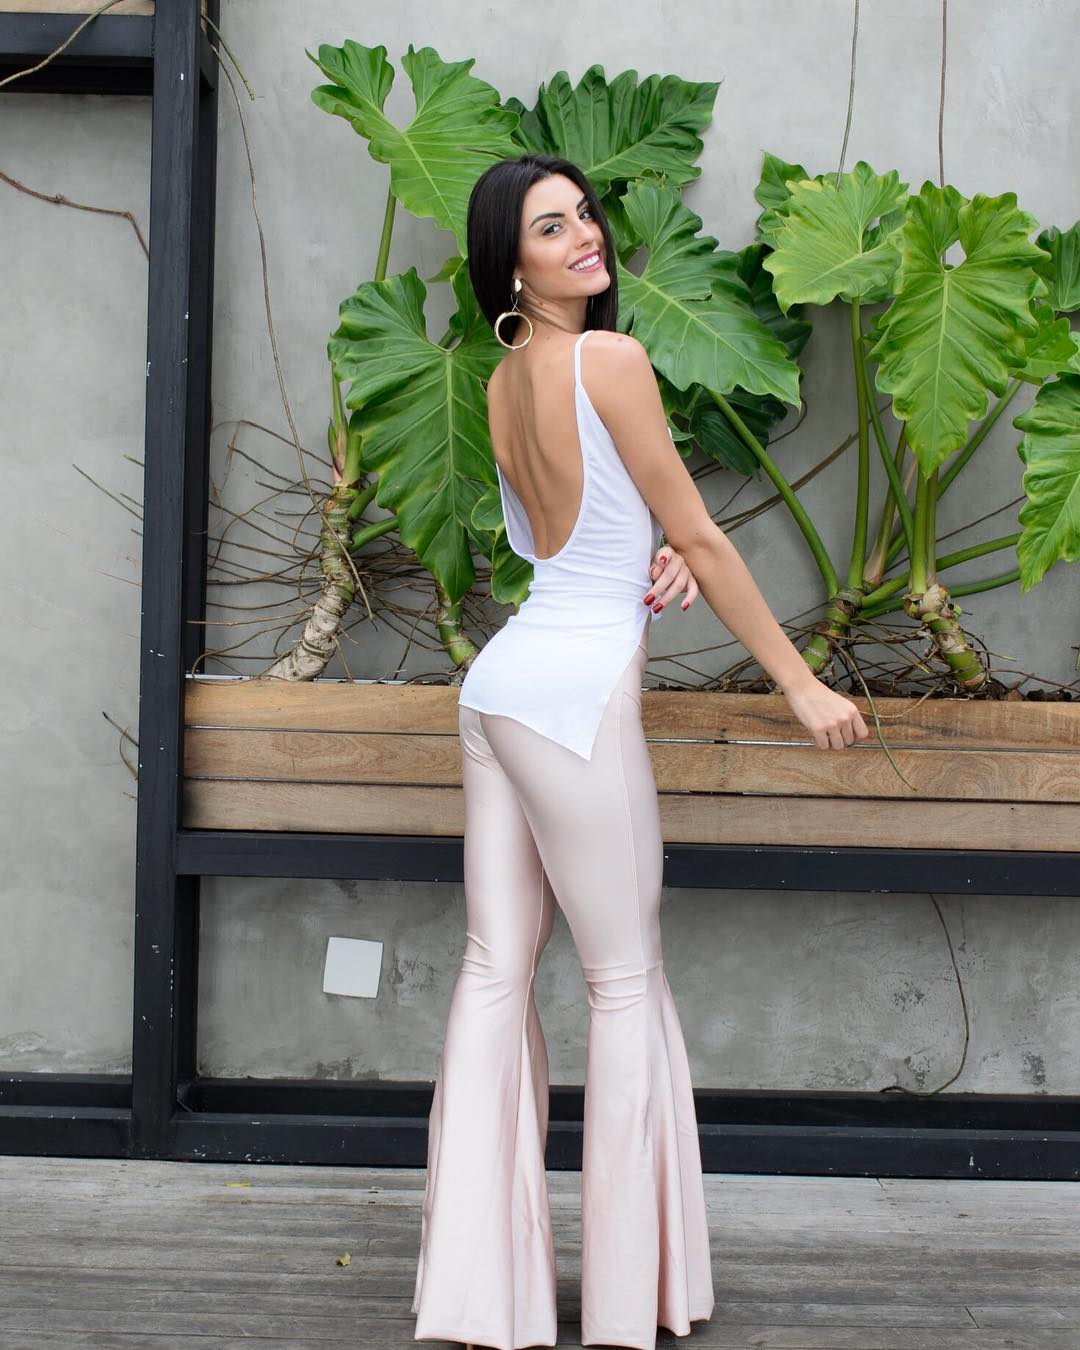 marjorie marcelle, top 5 de miss grand international 2019. - Página 2 42172710